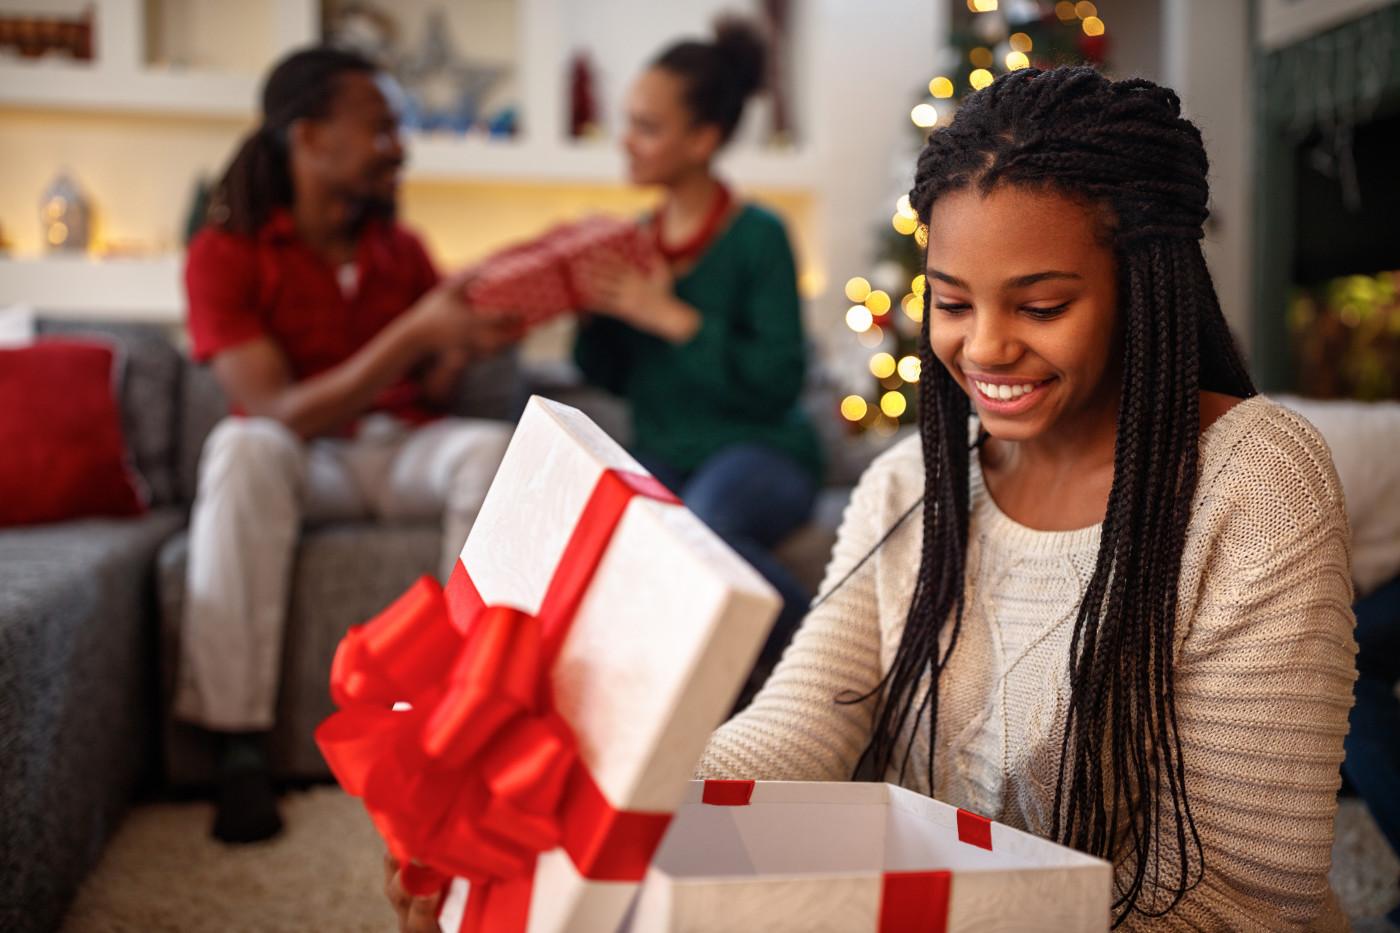 Excited gift recipient